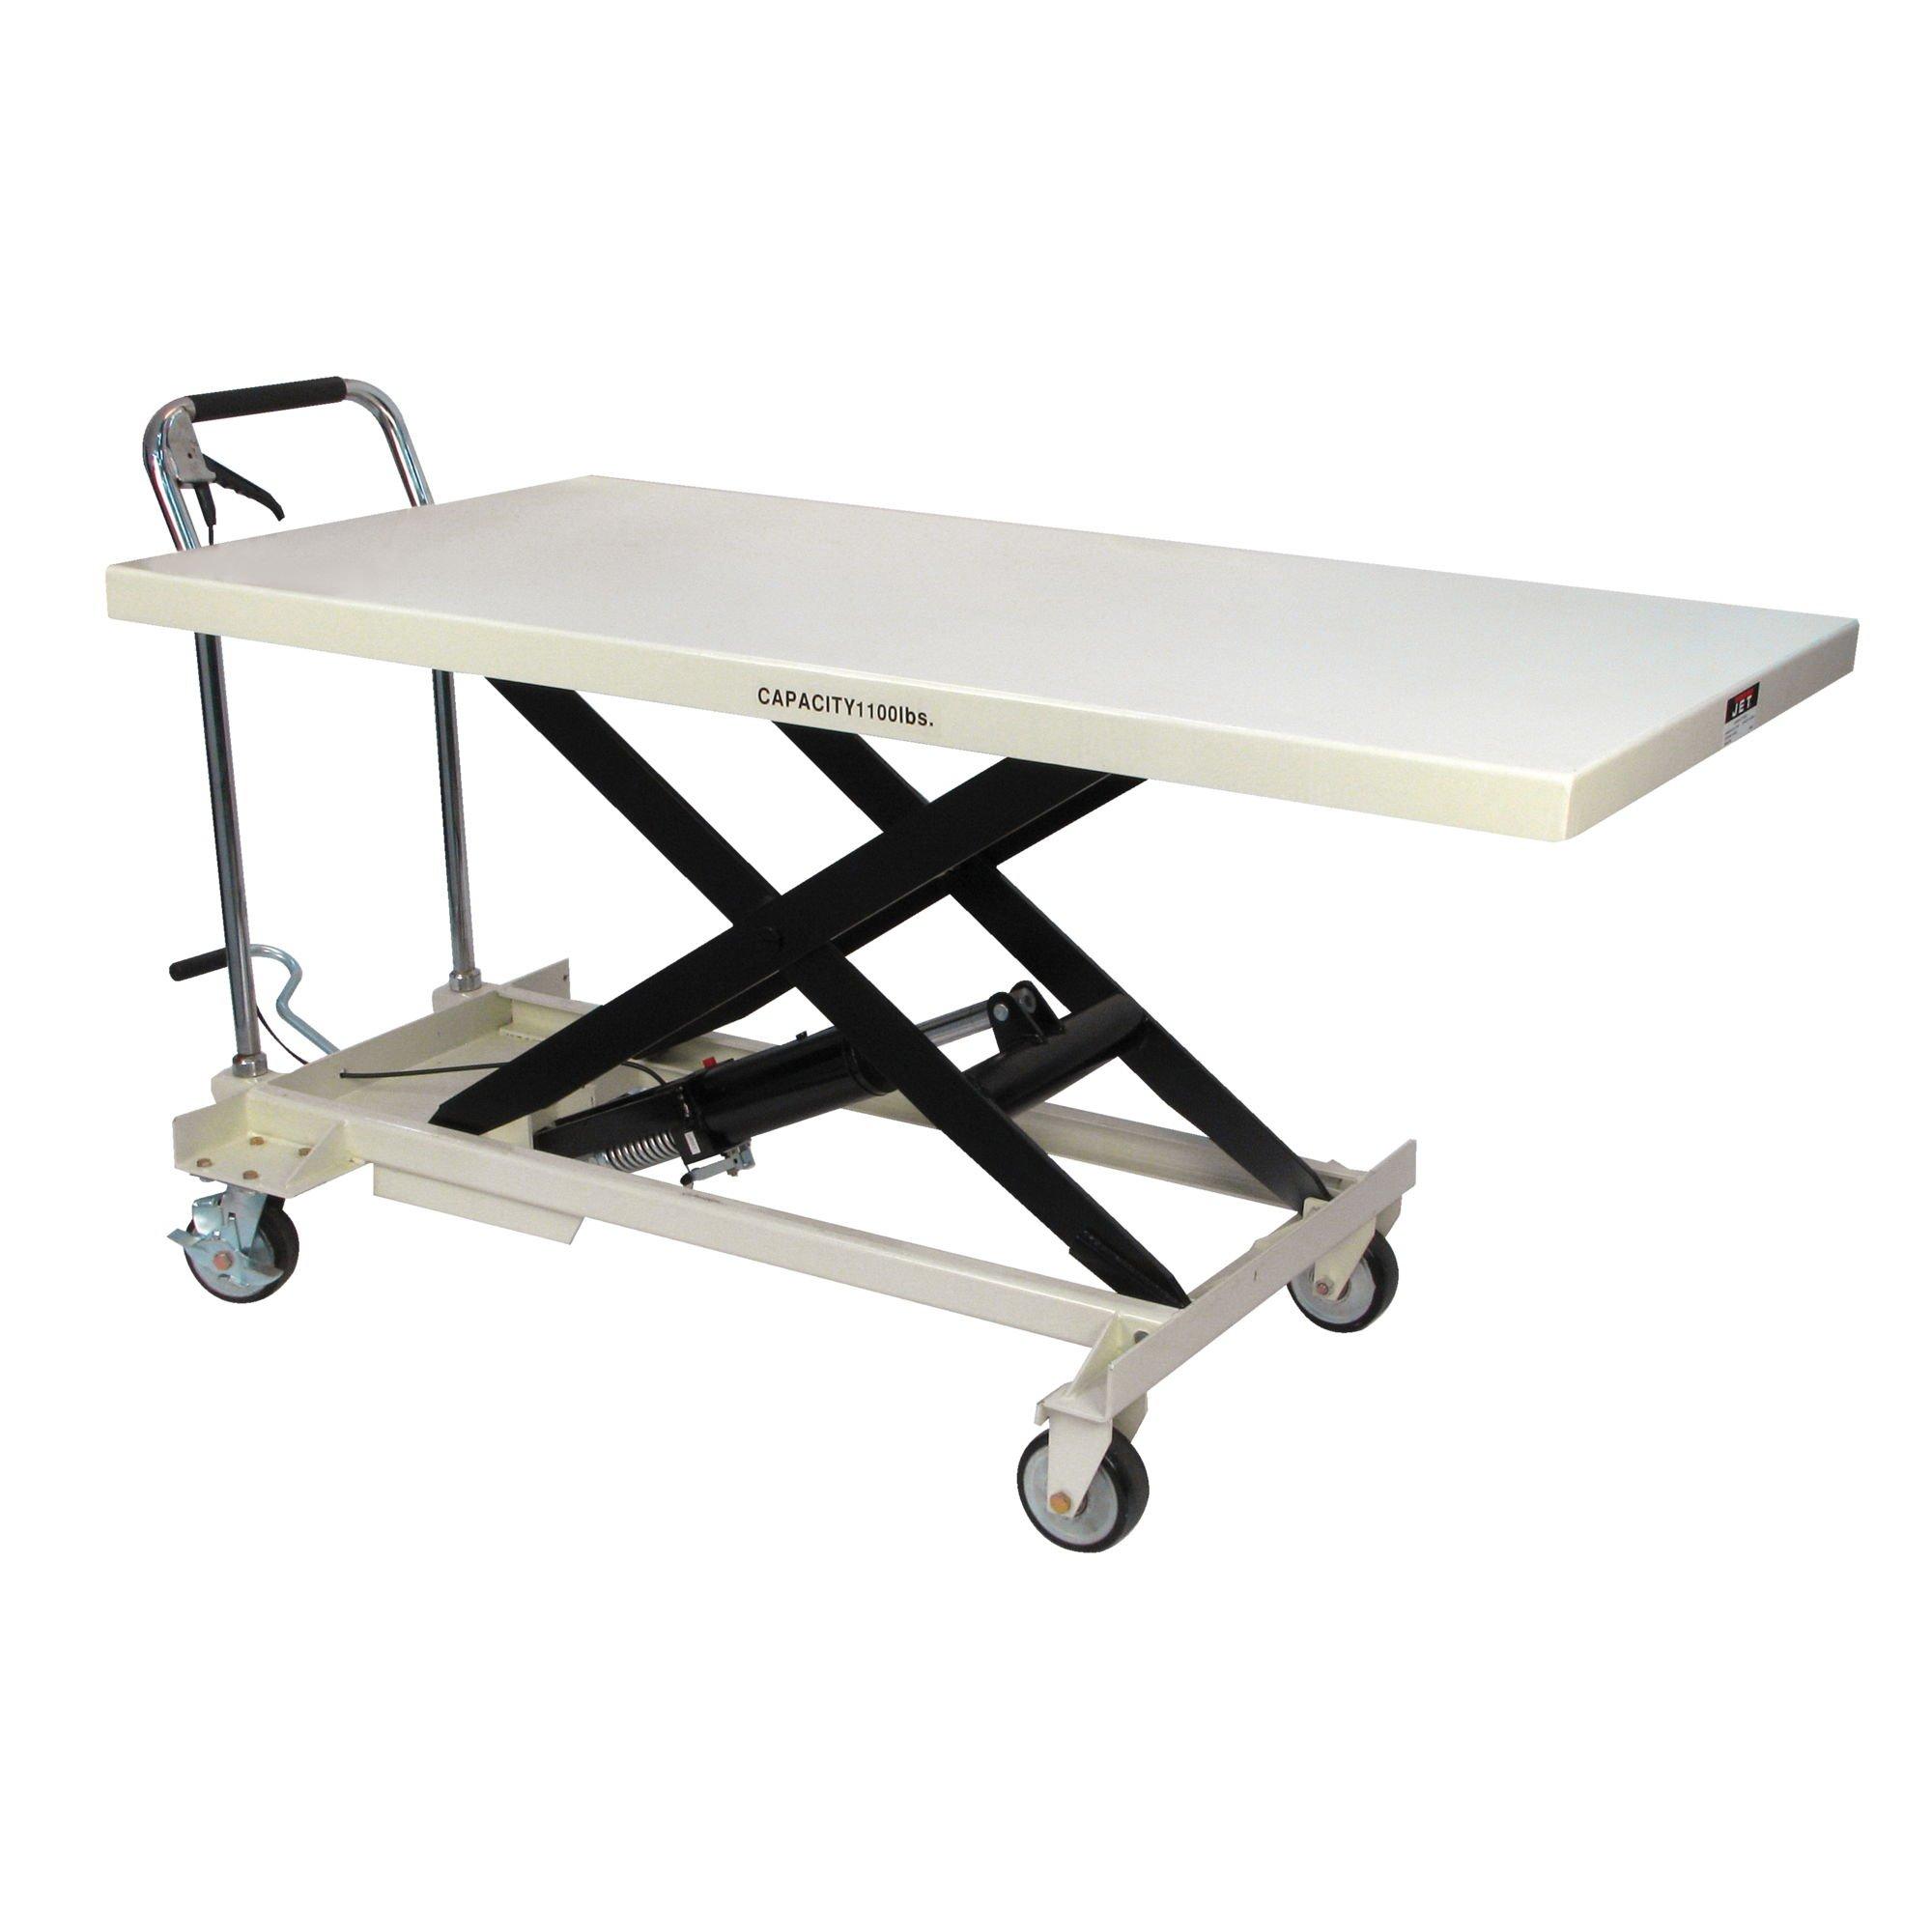 JET SLT-1100 Jumbo Scissor Lift Table